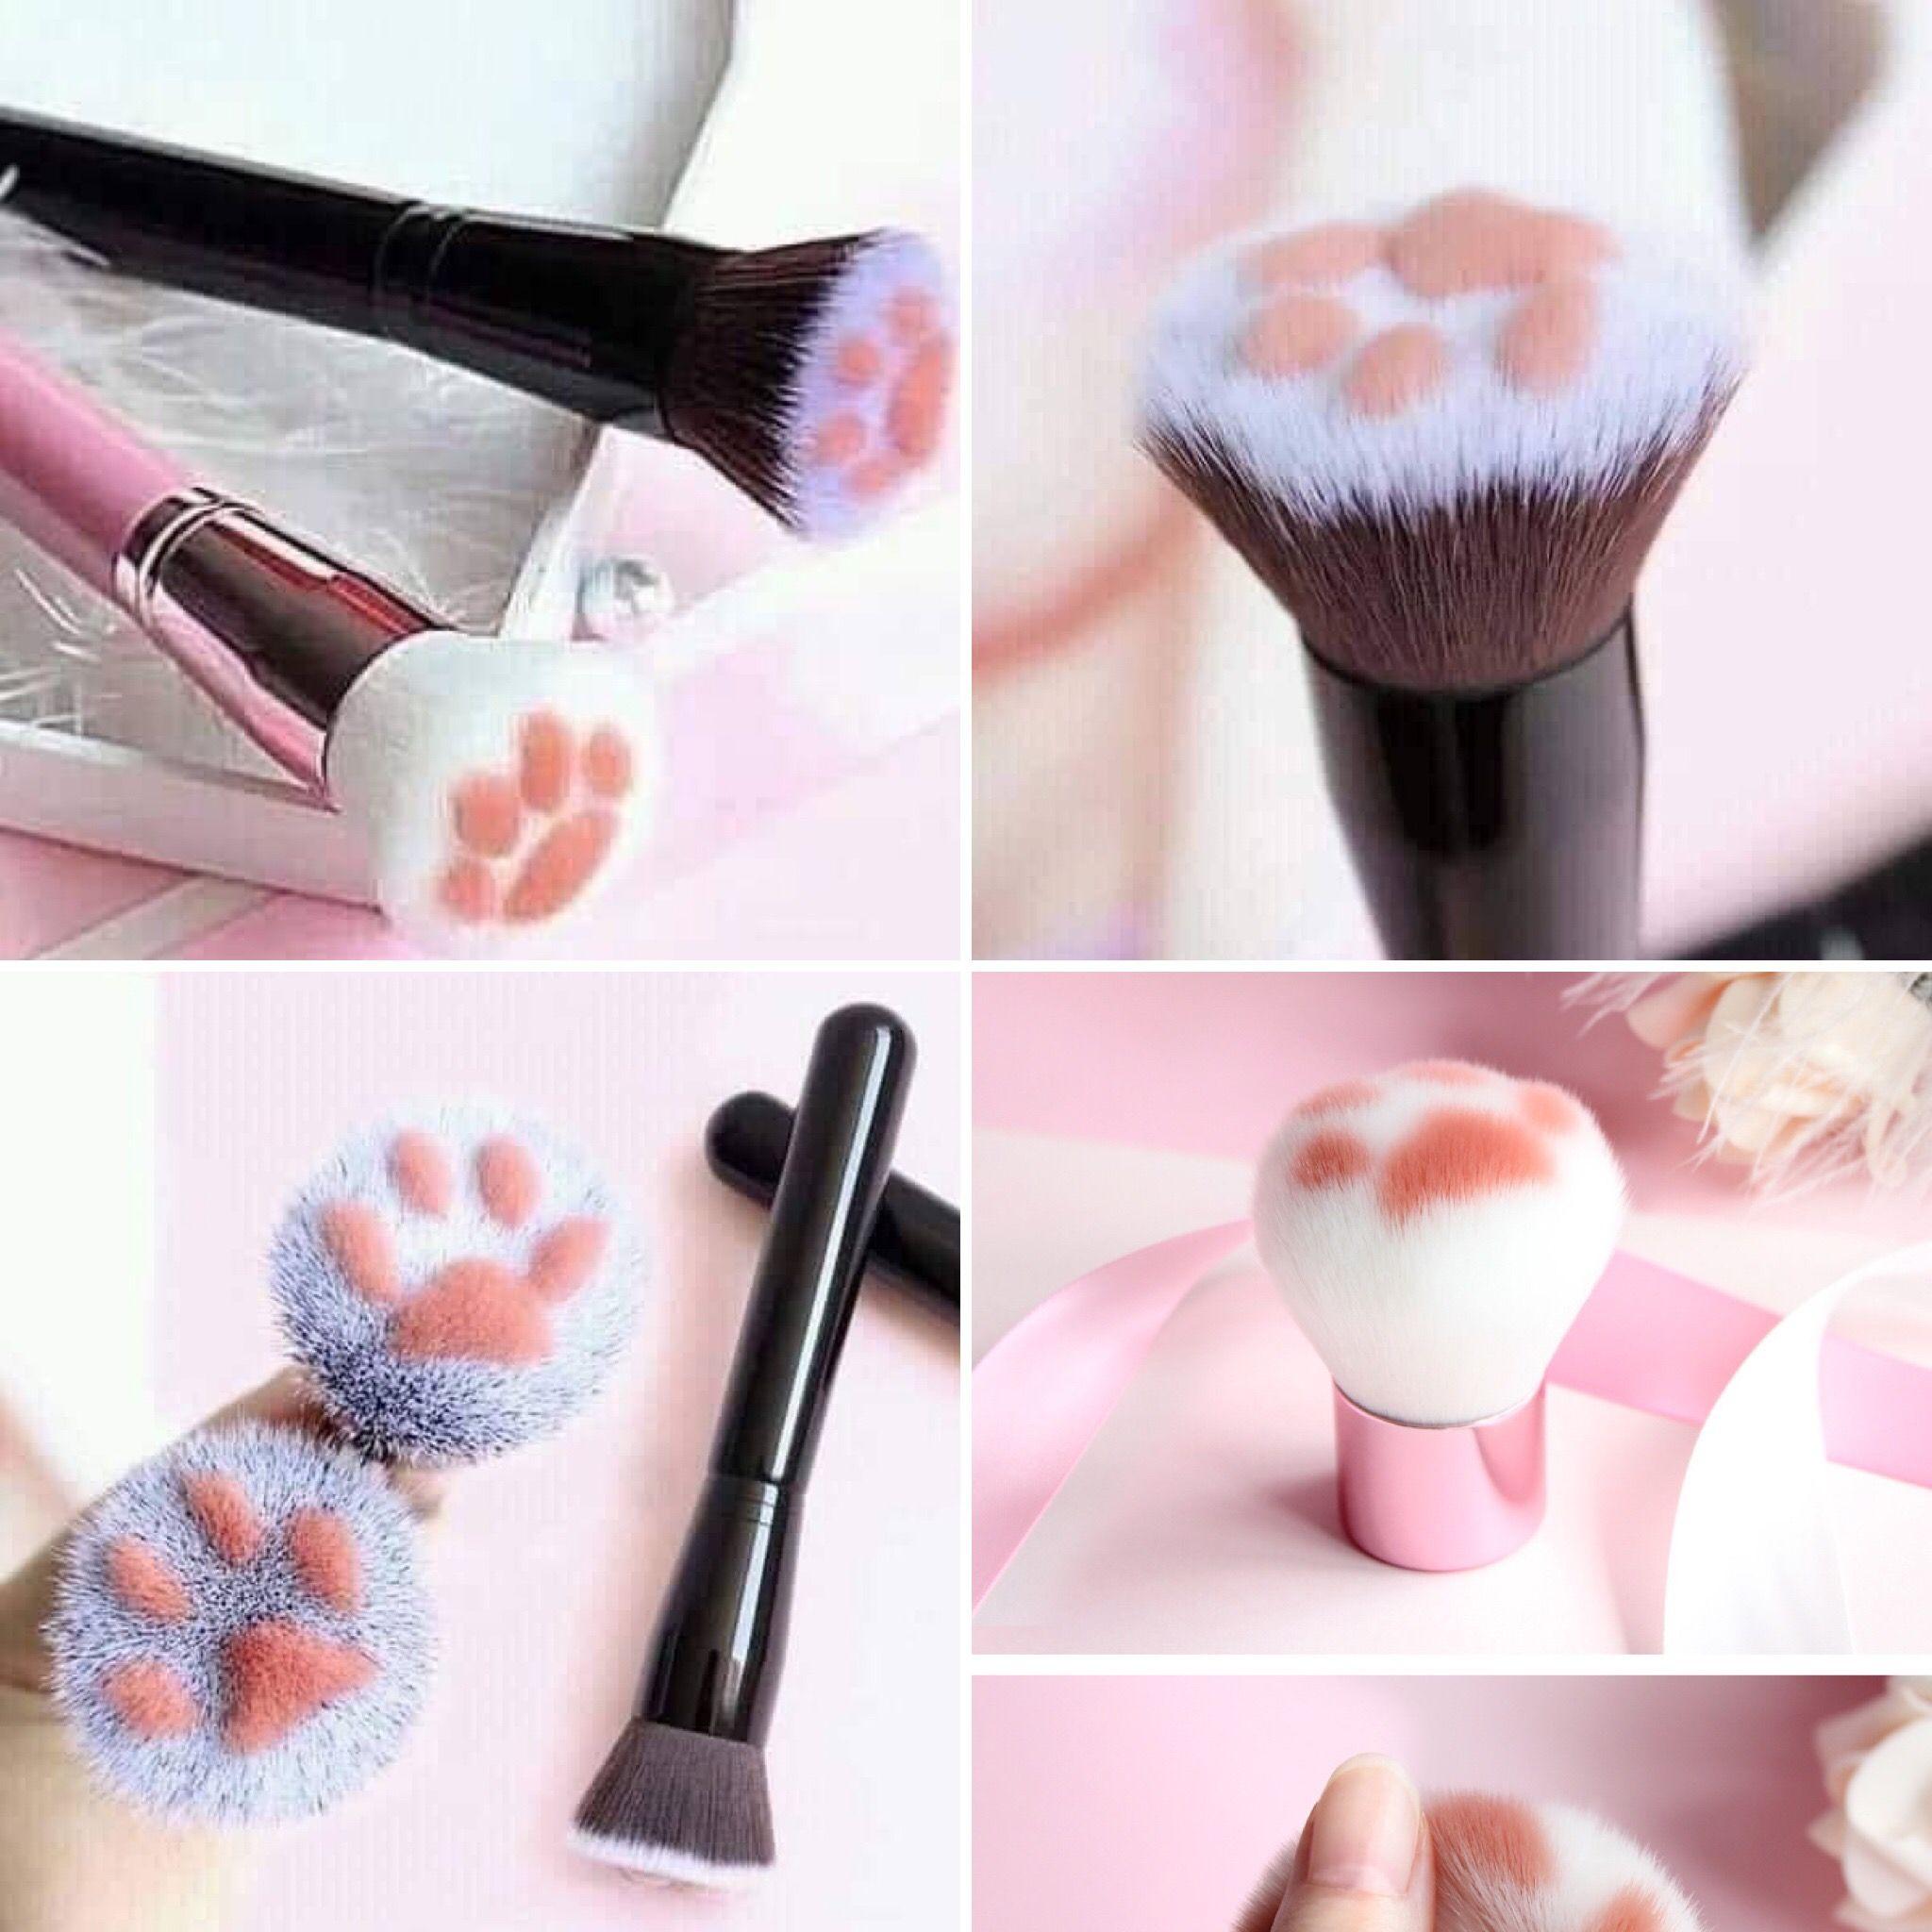 Adorable 😍😍😍 Cat Paw Makeup Brushes in 2020 Makeup